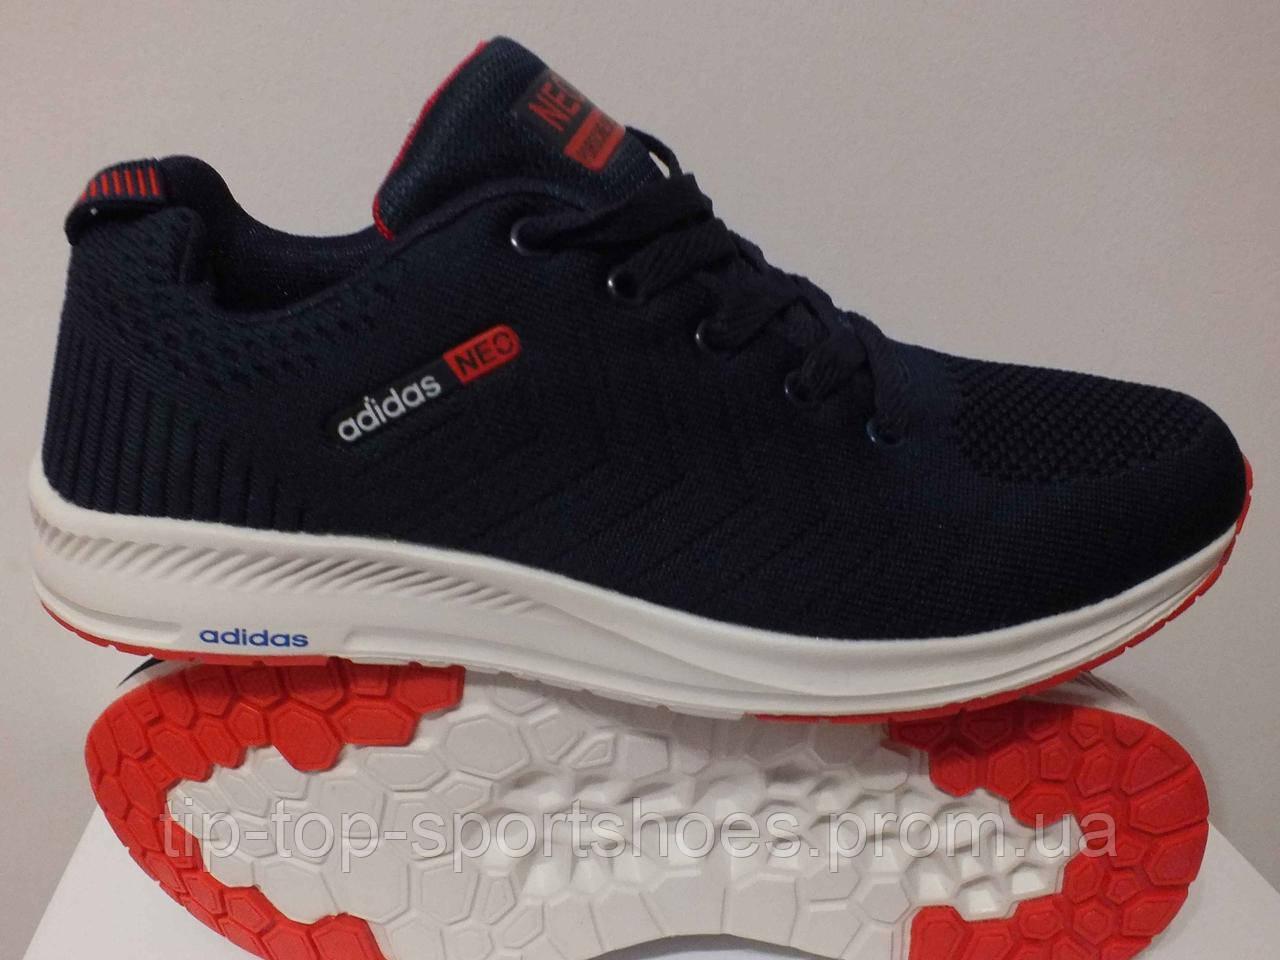 Adidas NEO PORSCHE DESIGN